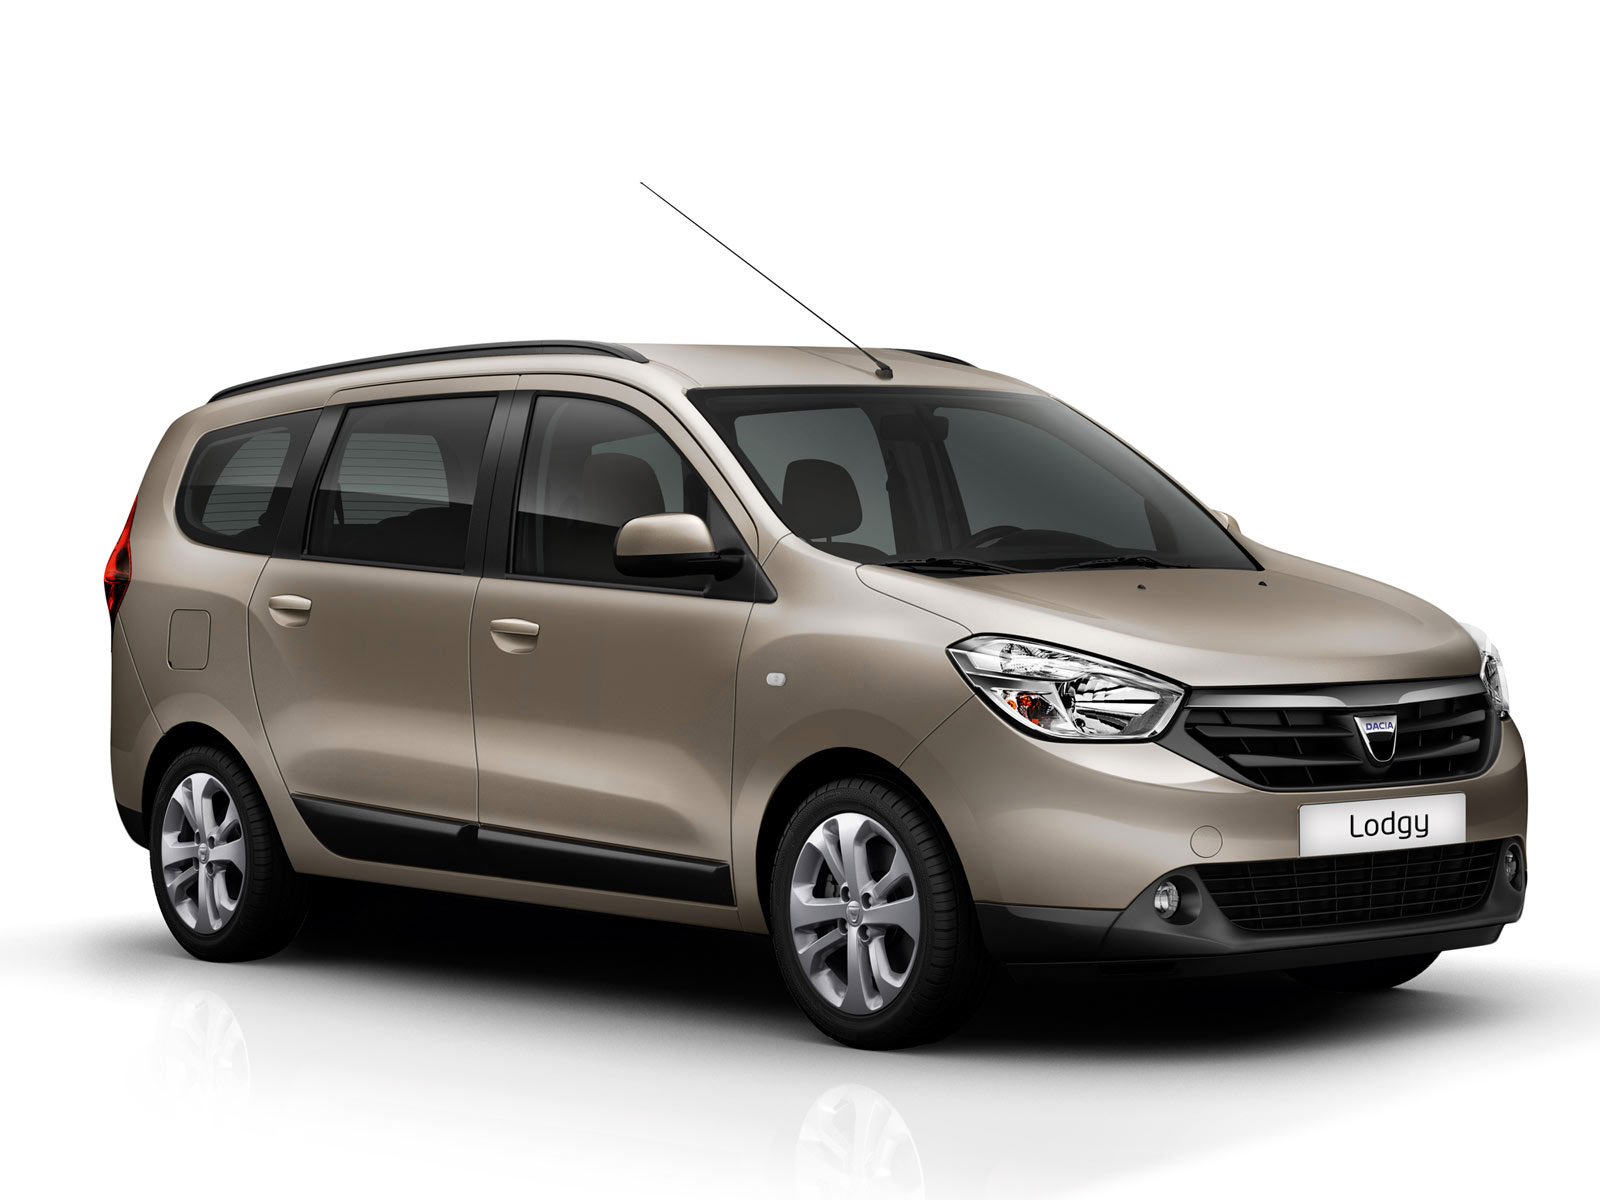 Dacia Lodgy: Jul 7, 2012